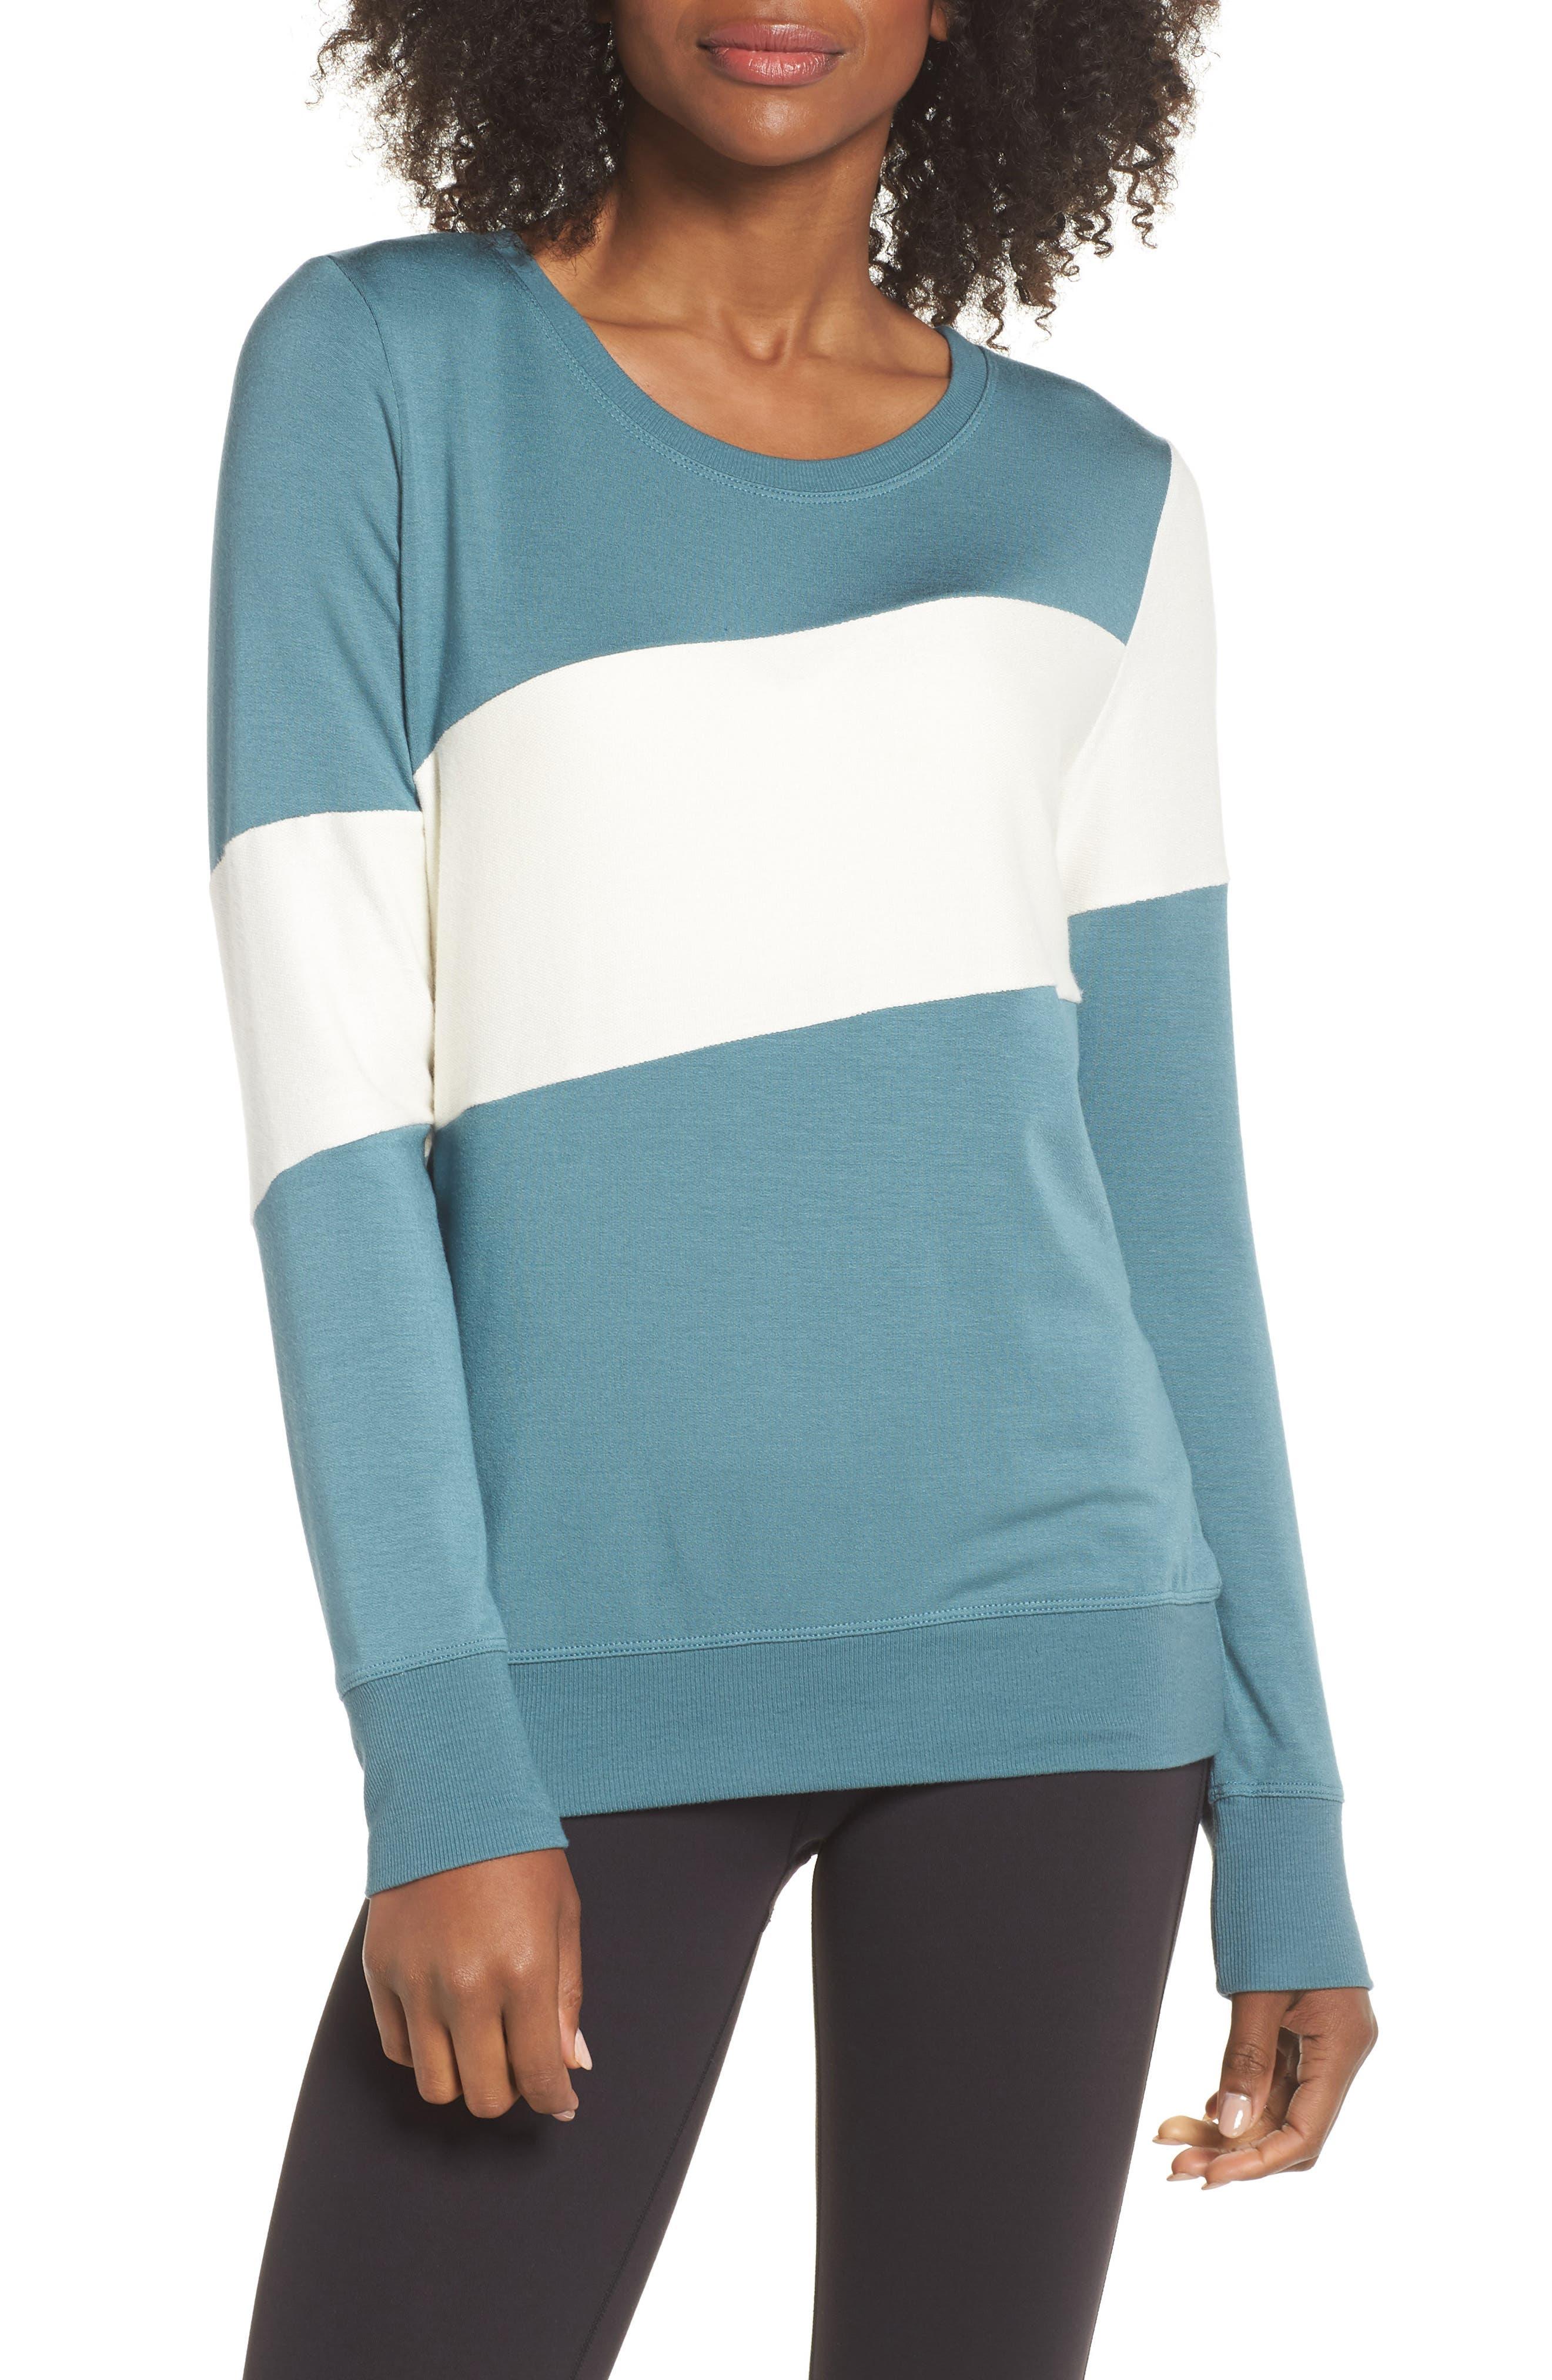 Ramp Sweatshirt,                         Main,                         color, Blue Surf/ Off White